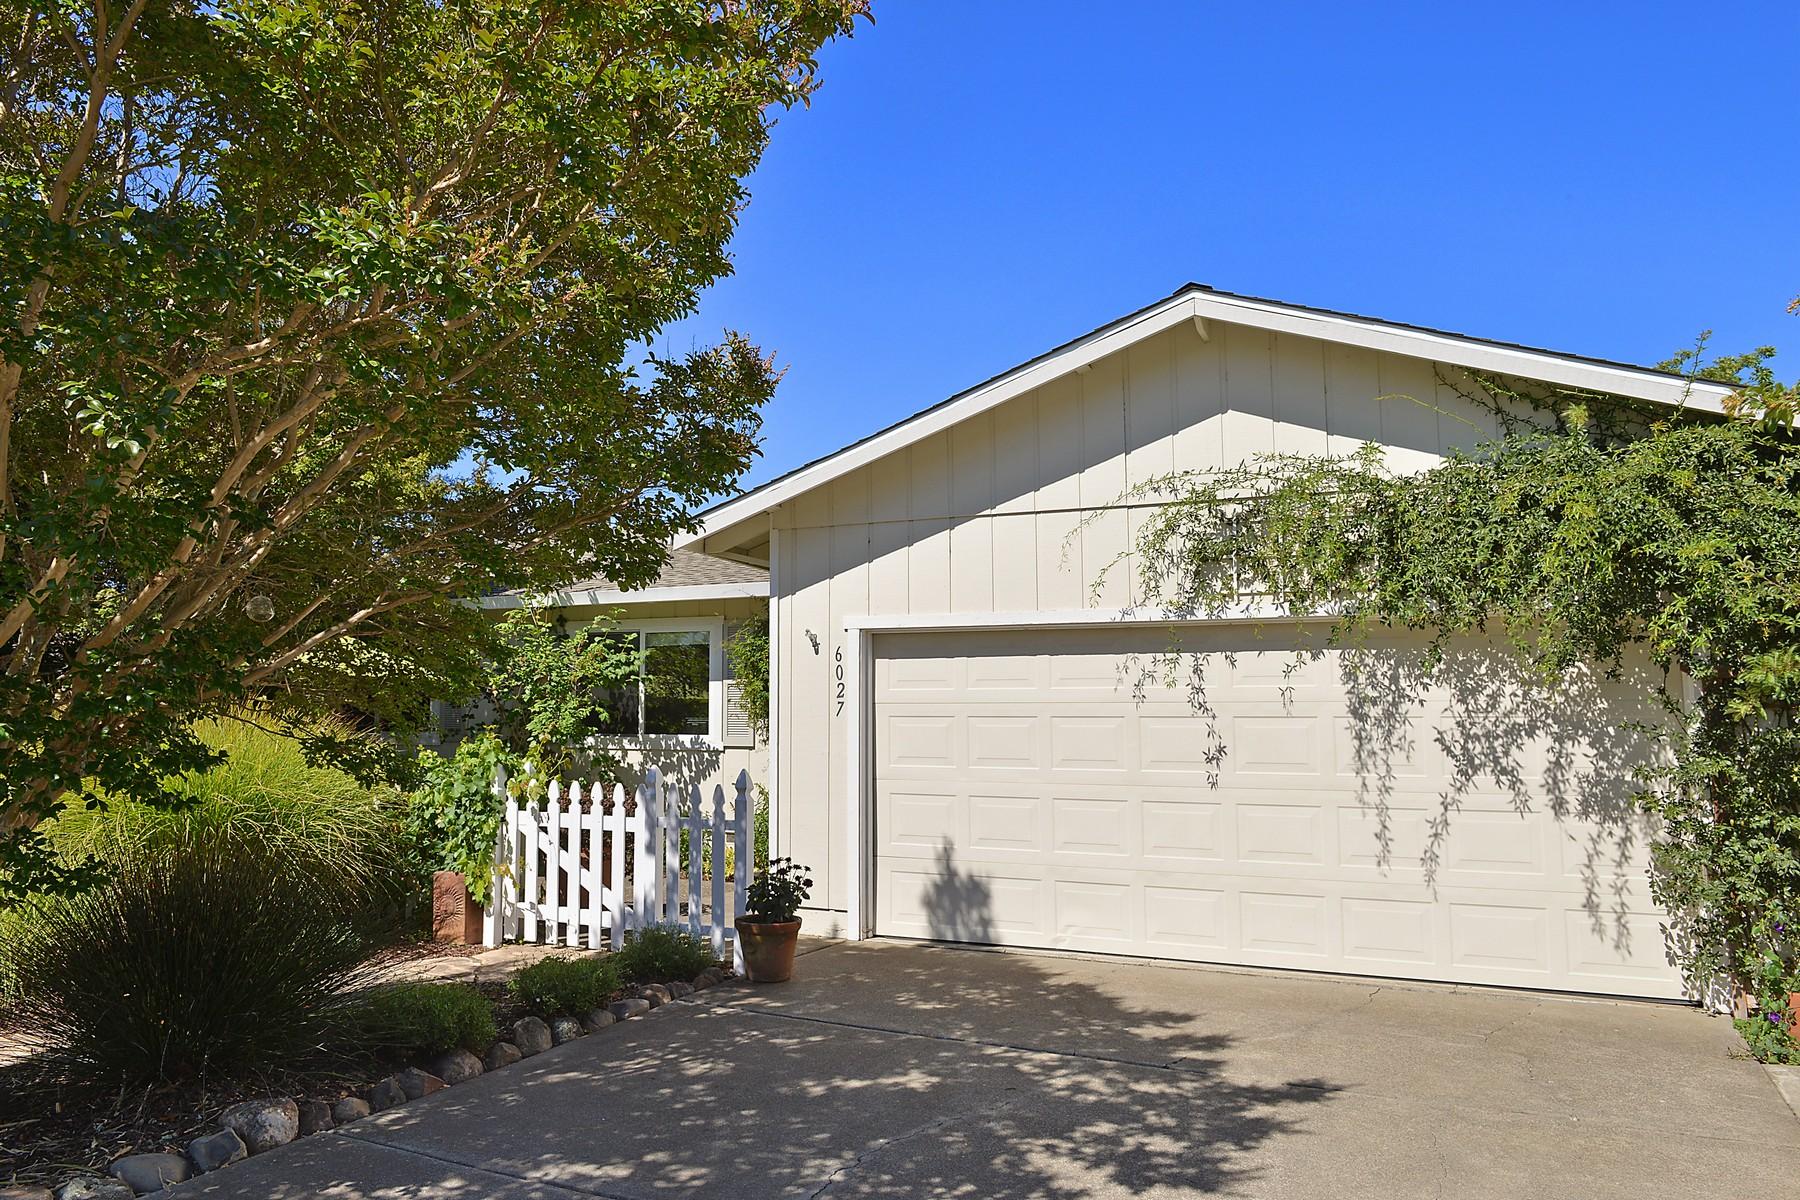 Single Family Home for Sale at 6027 Rick Drive Santa Rosa, California 95409 United States